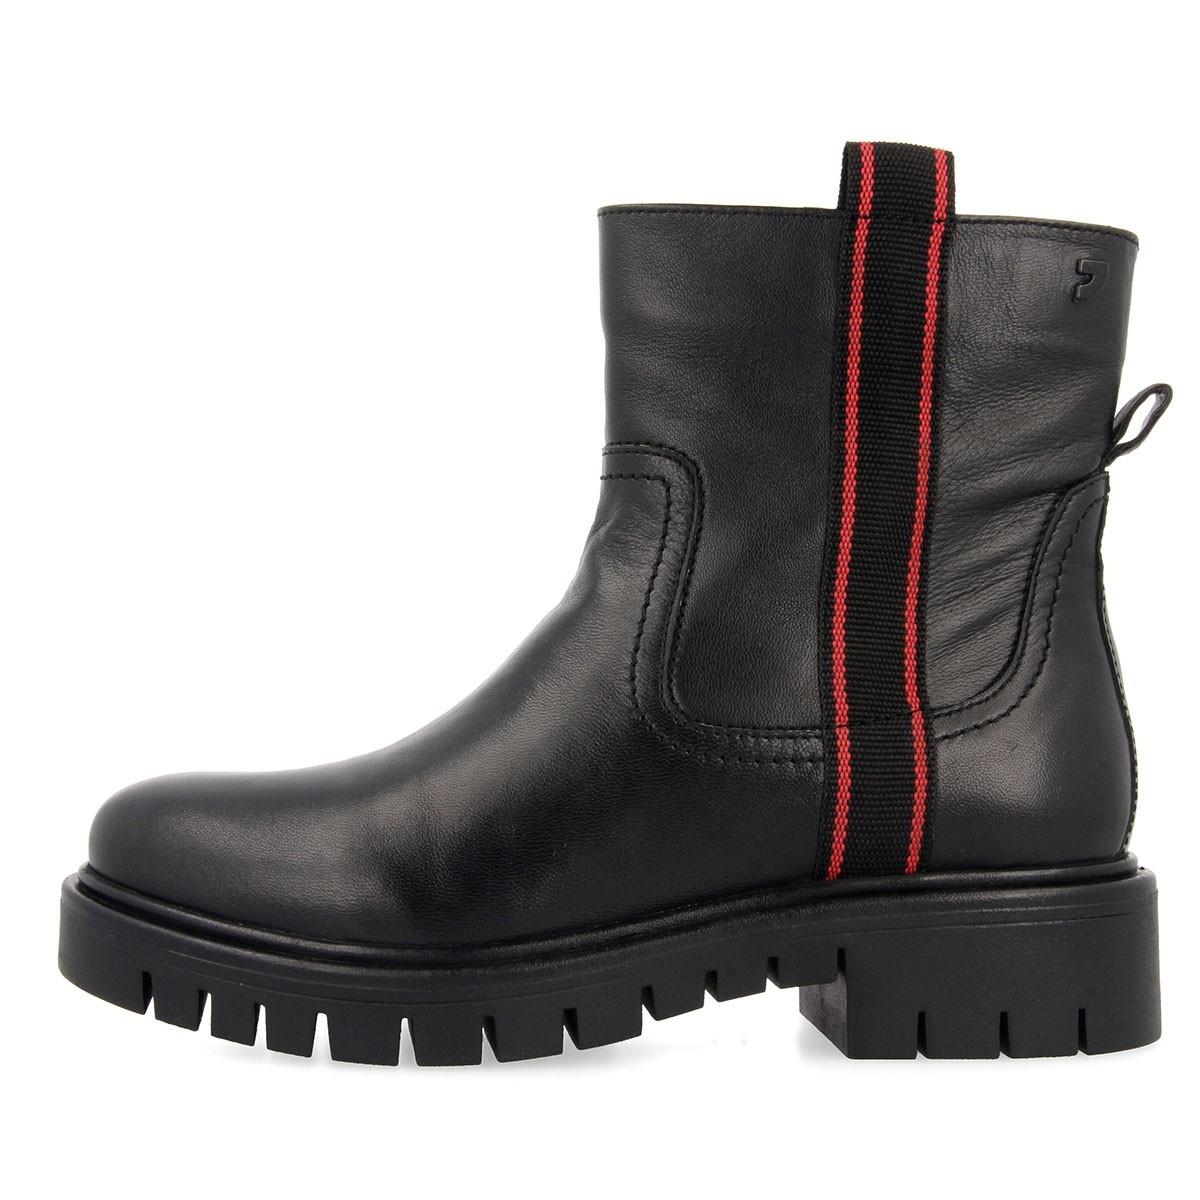 56554 Black BOOTS 2